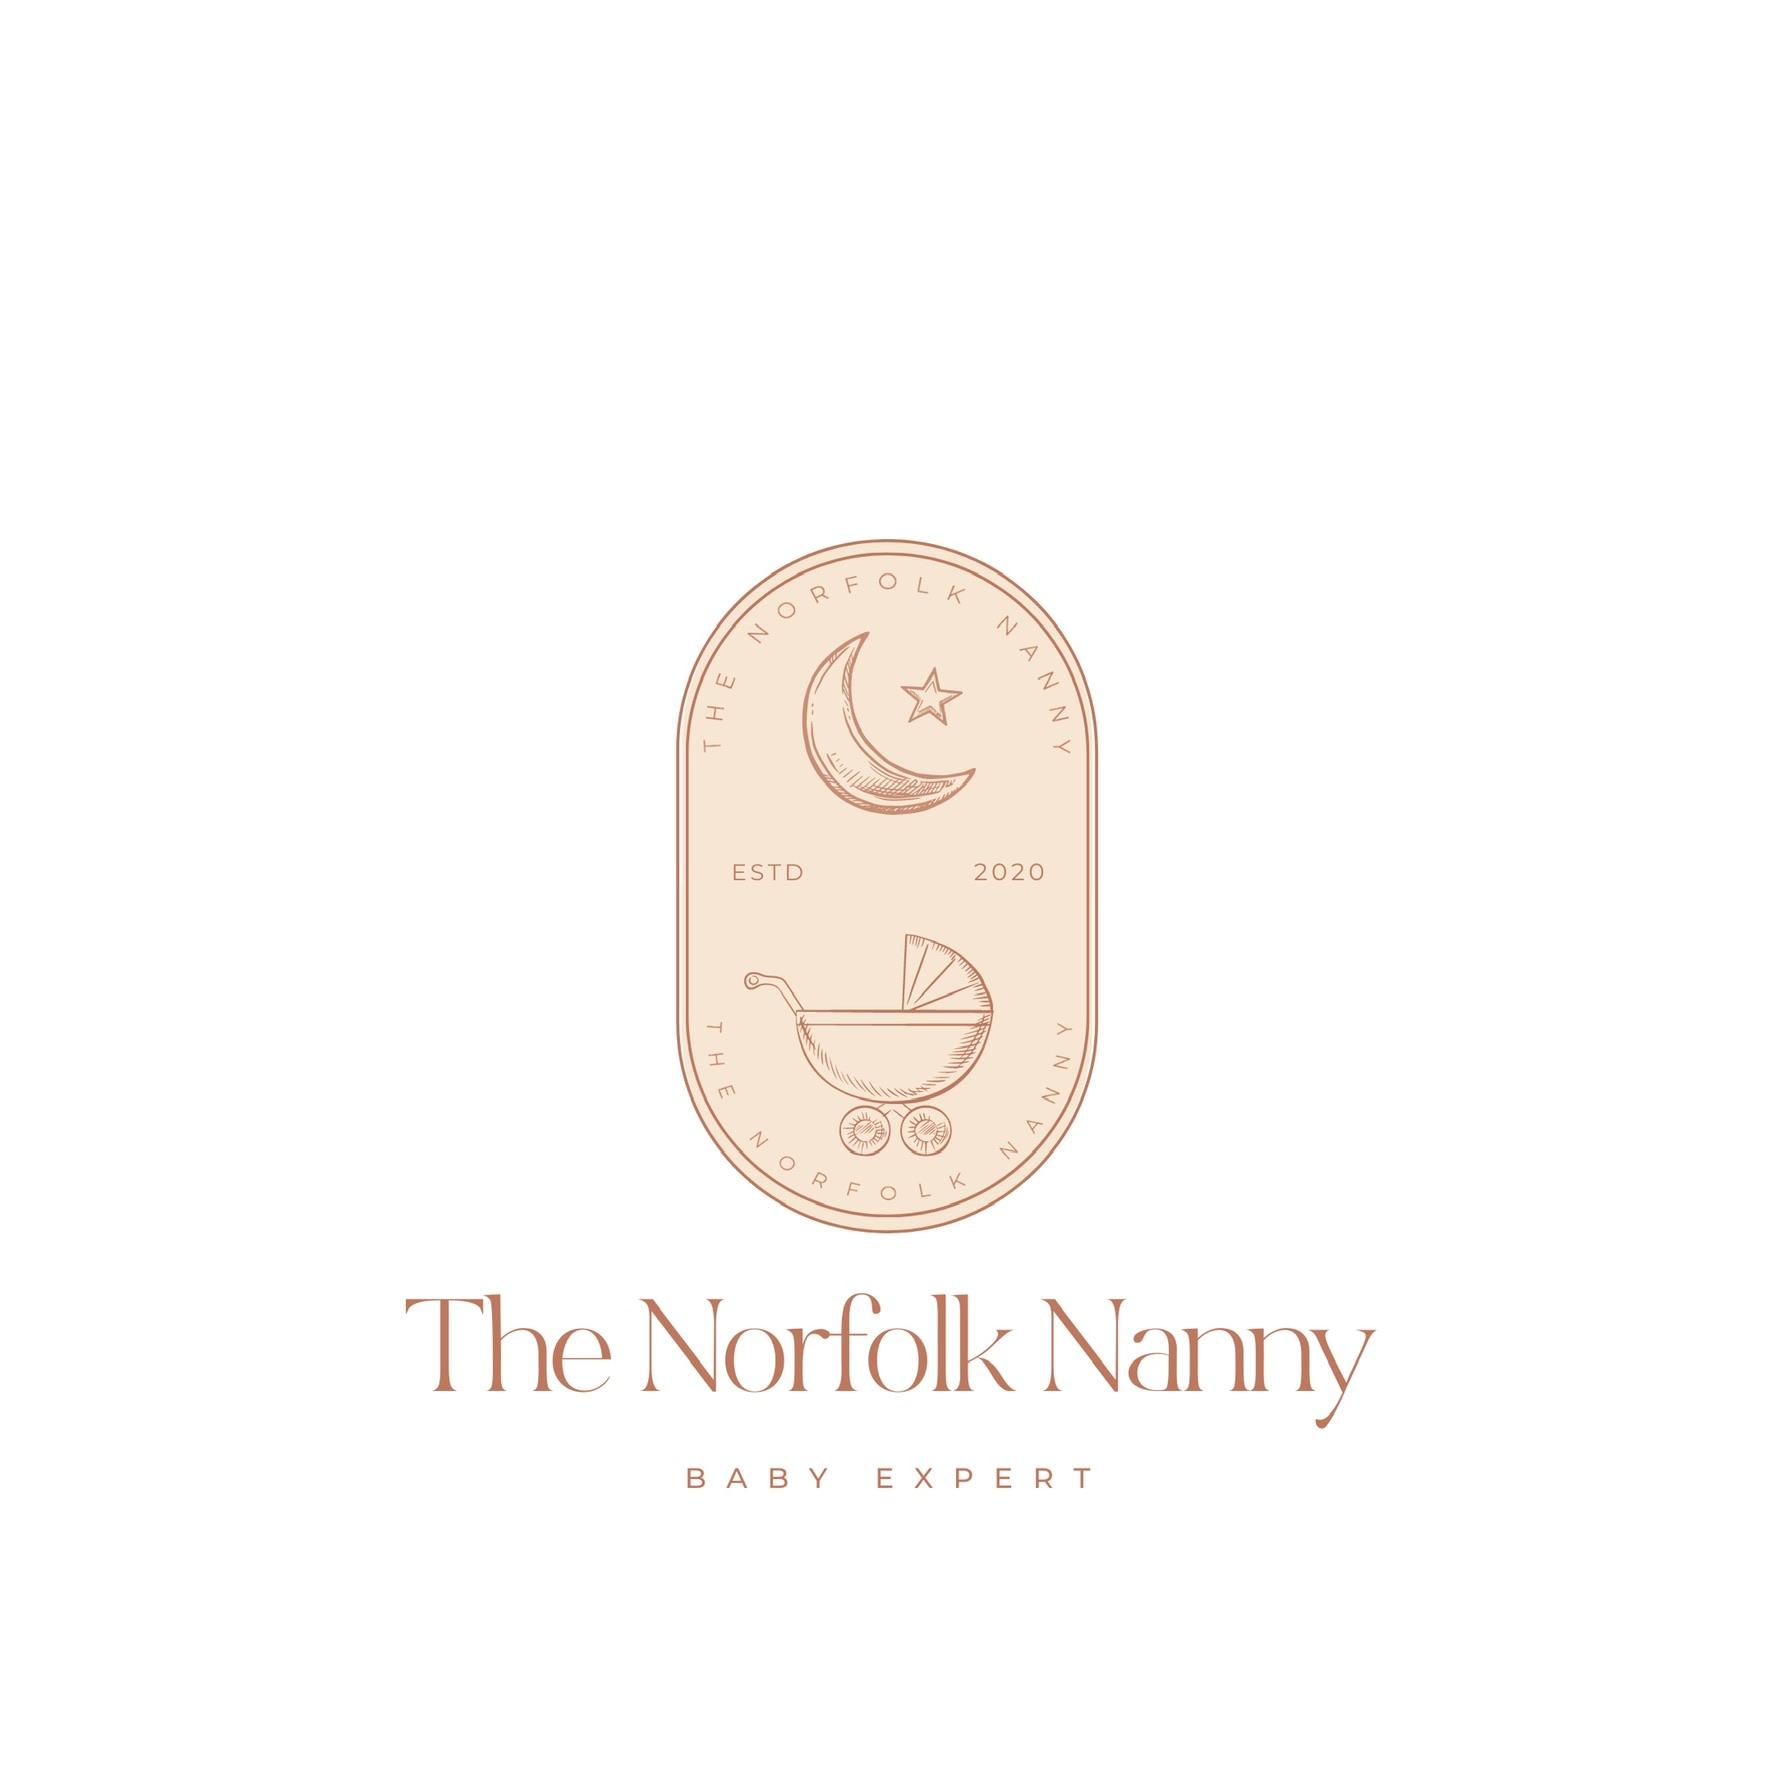 The Norfolk Nanny's logo